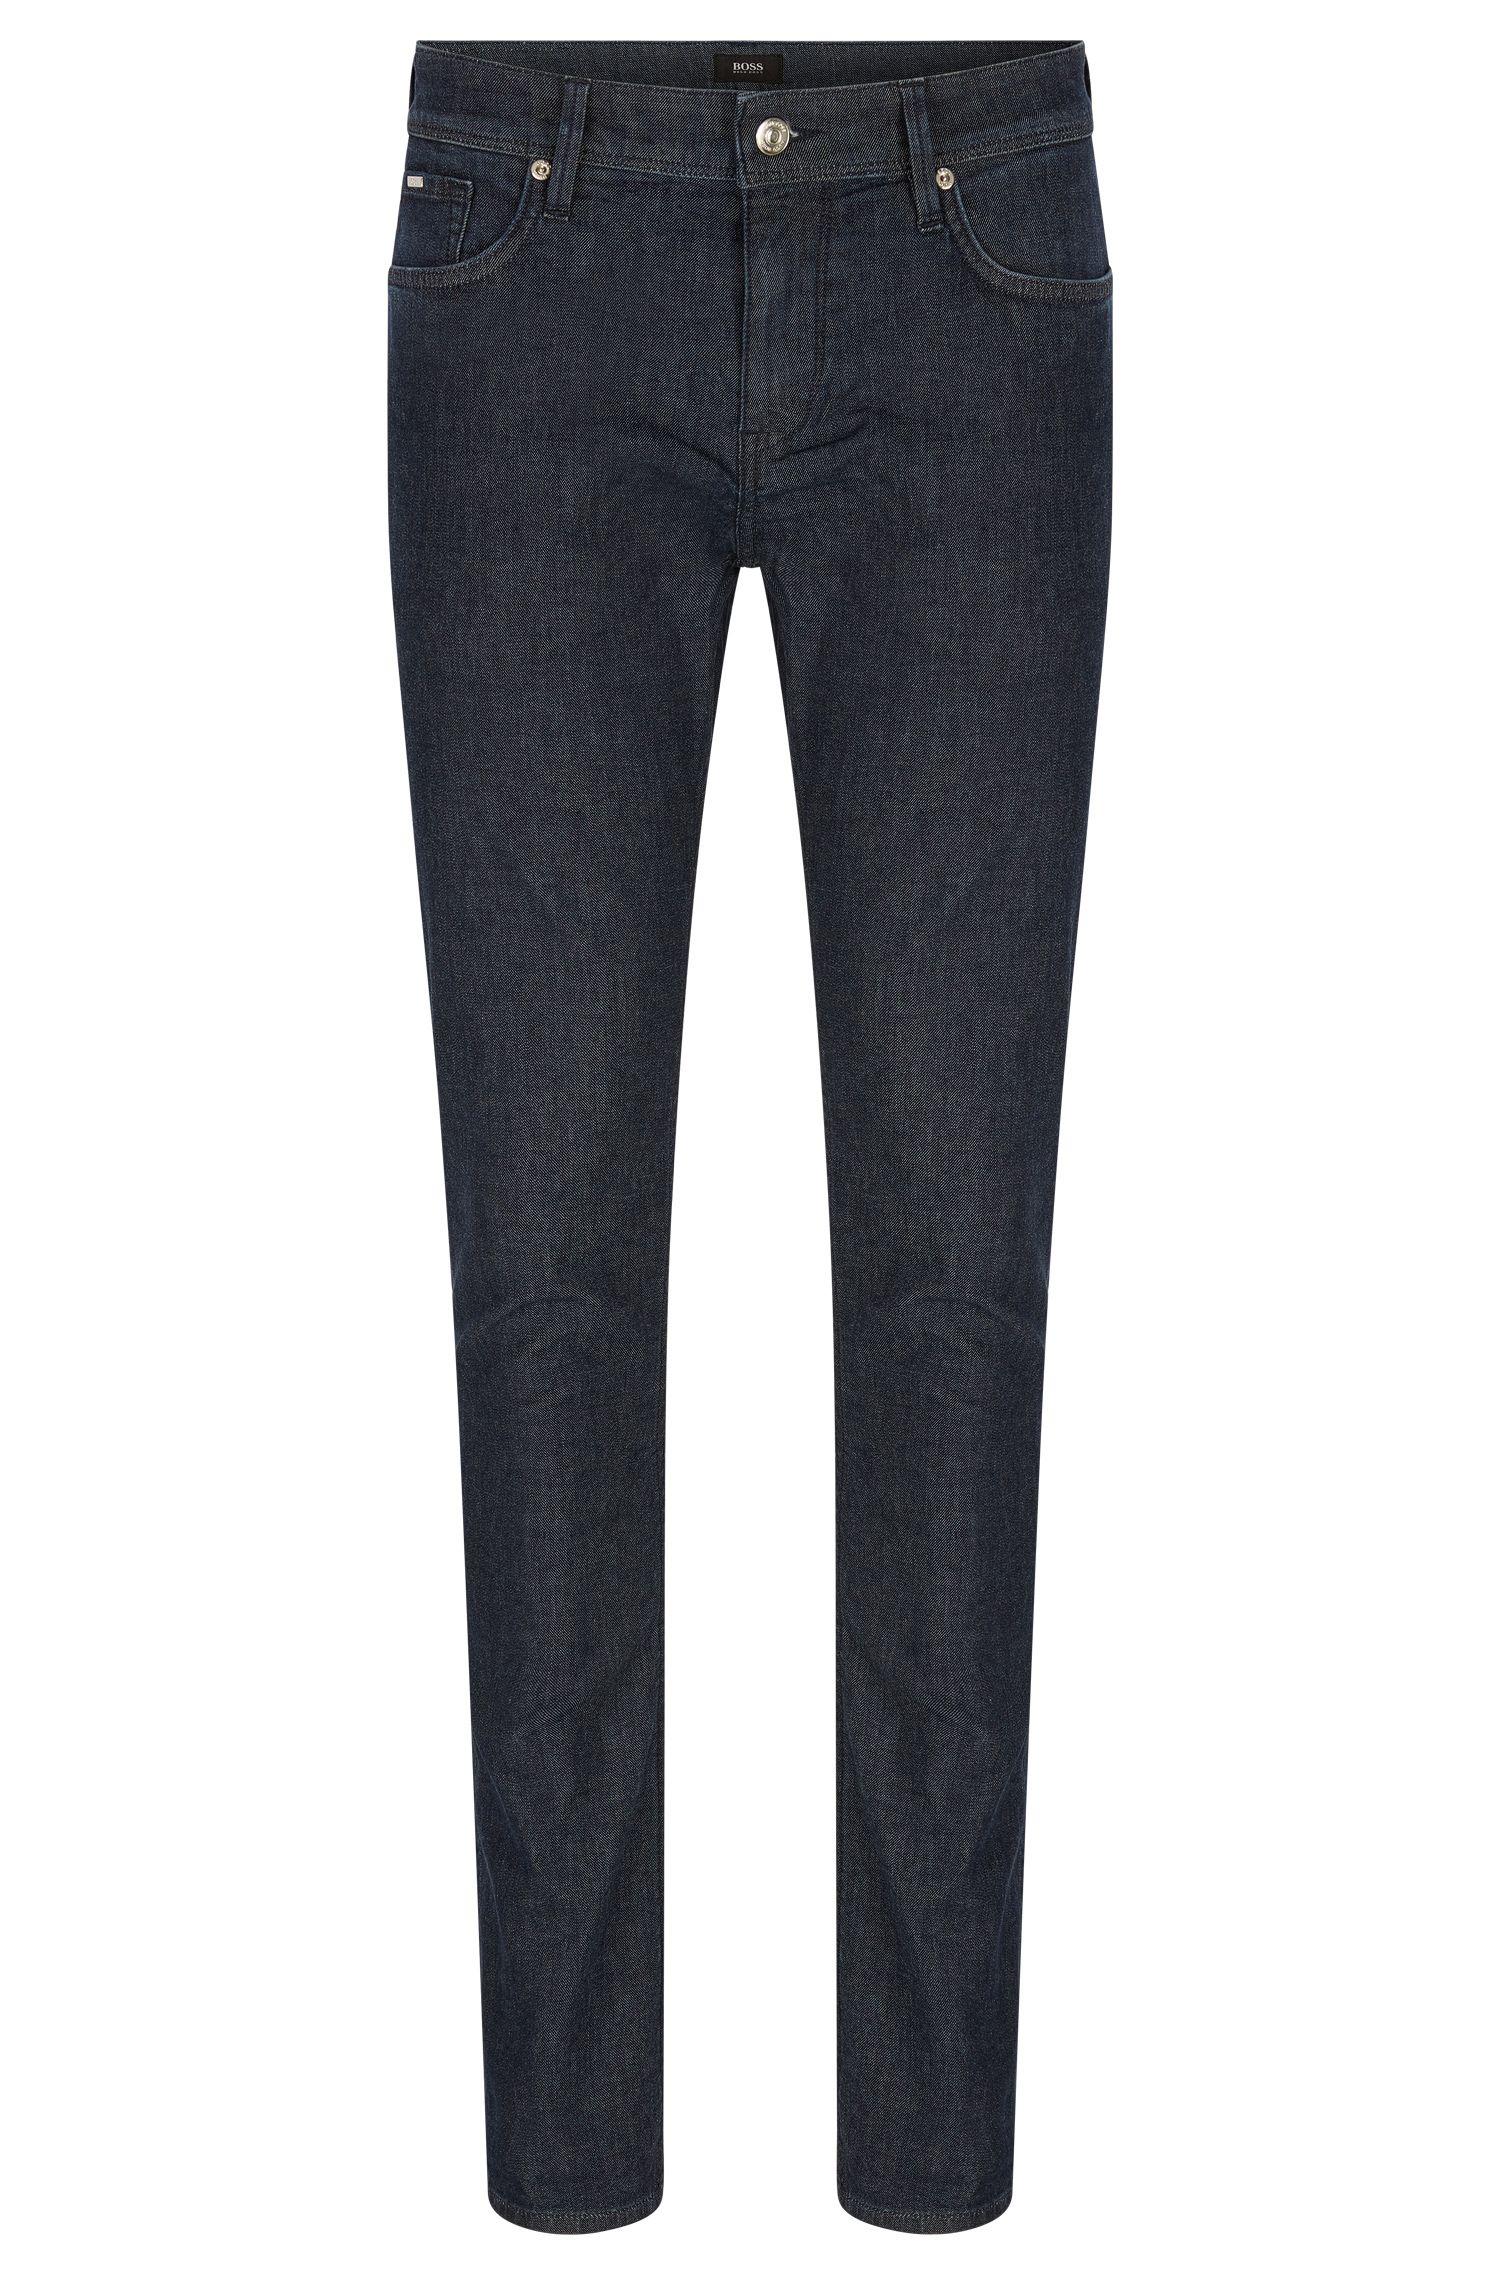 'Charleston' | Extra-Slim Fit, 9 oz Stretch Cotton Pant